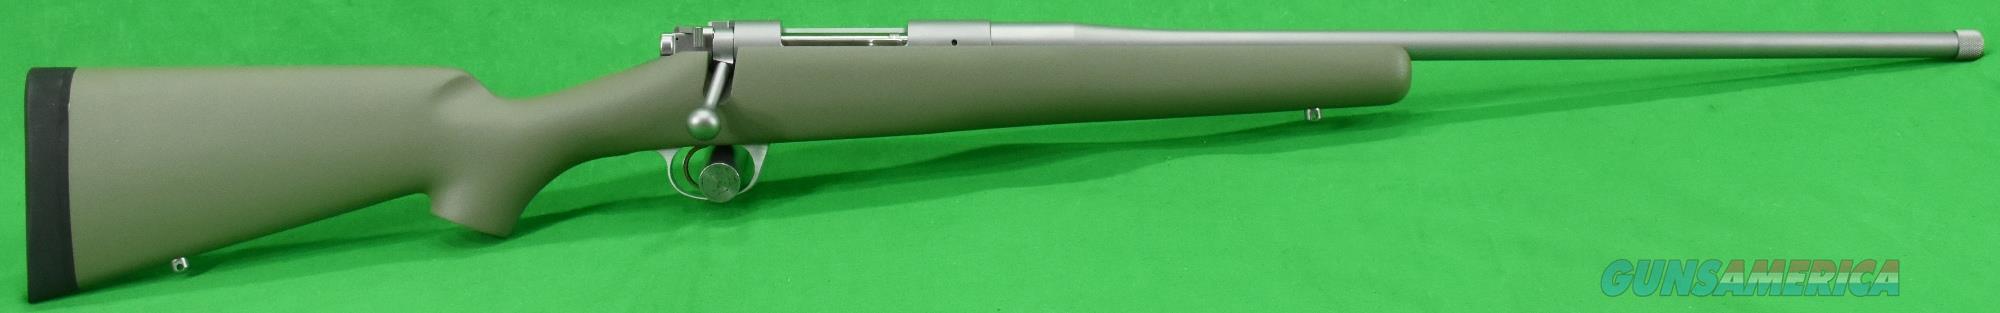 84M Montana Green 6.5CM 22In TB  3000799  Guns > Rifles > Kimber of America Rifles